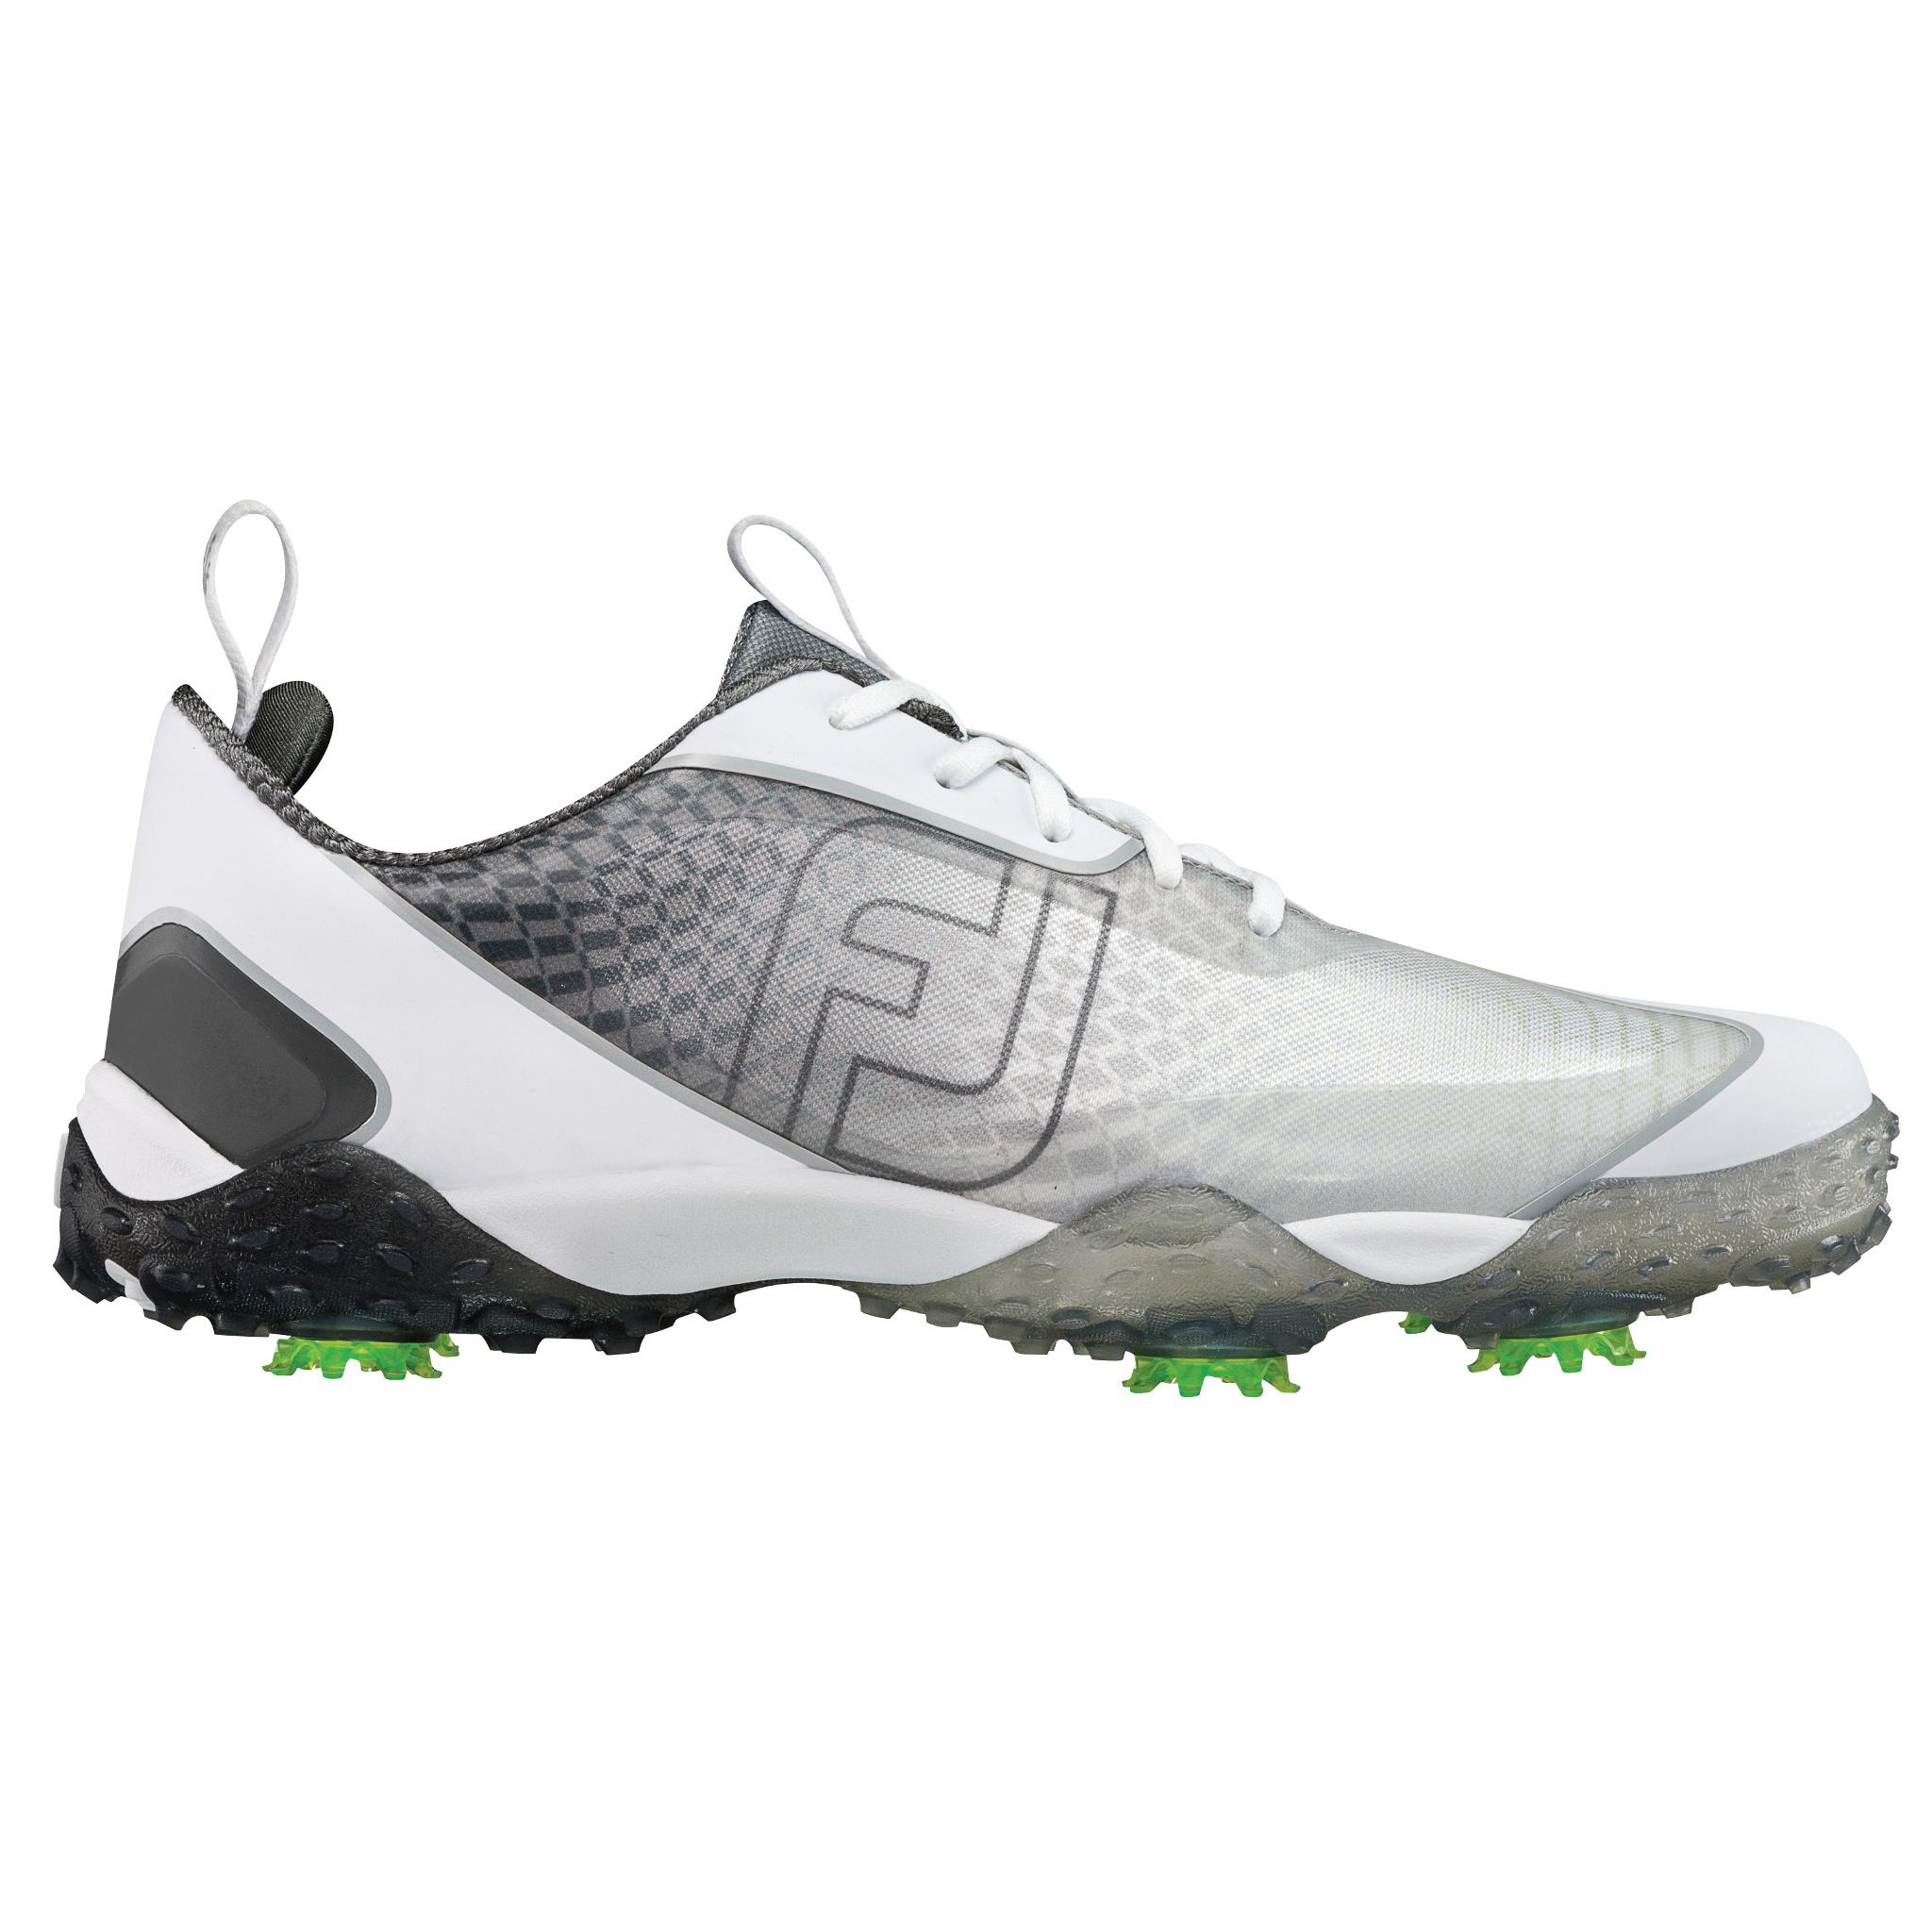 FootJoy Freestyle 2.0 Men's Golf Shoe